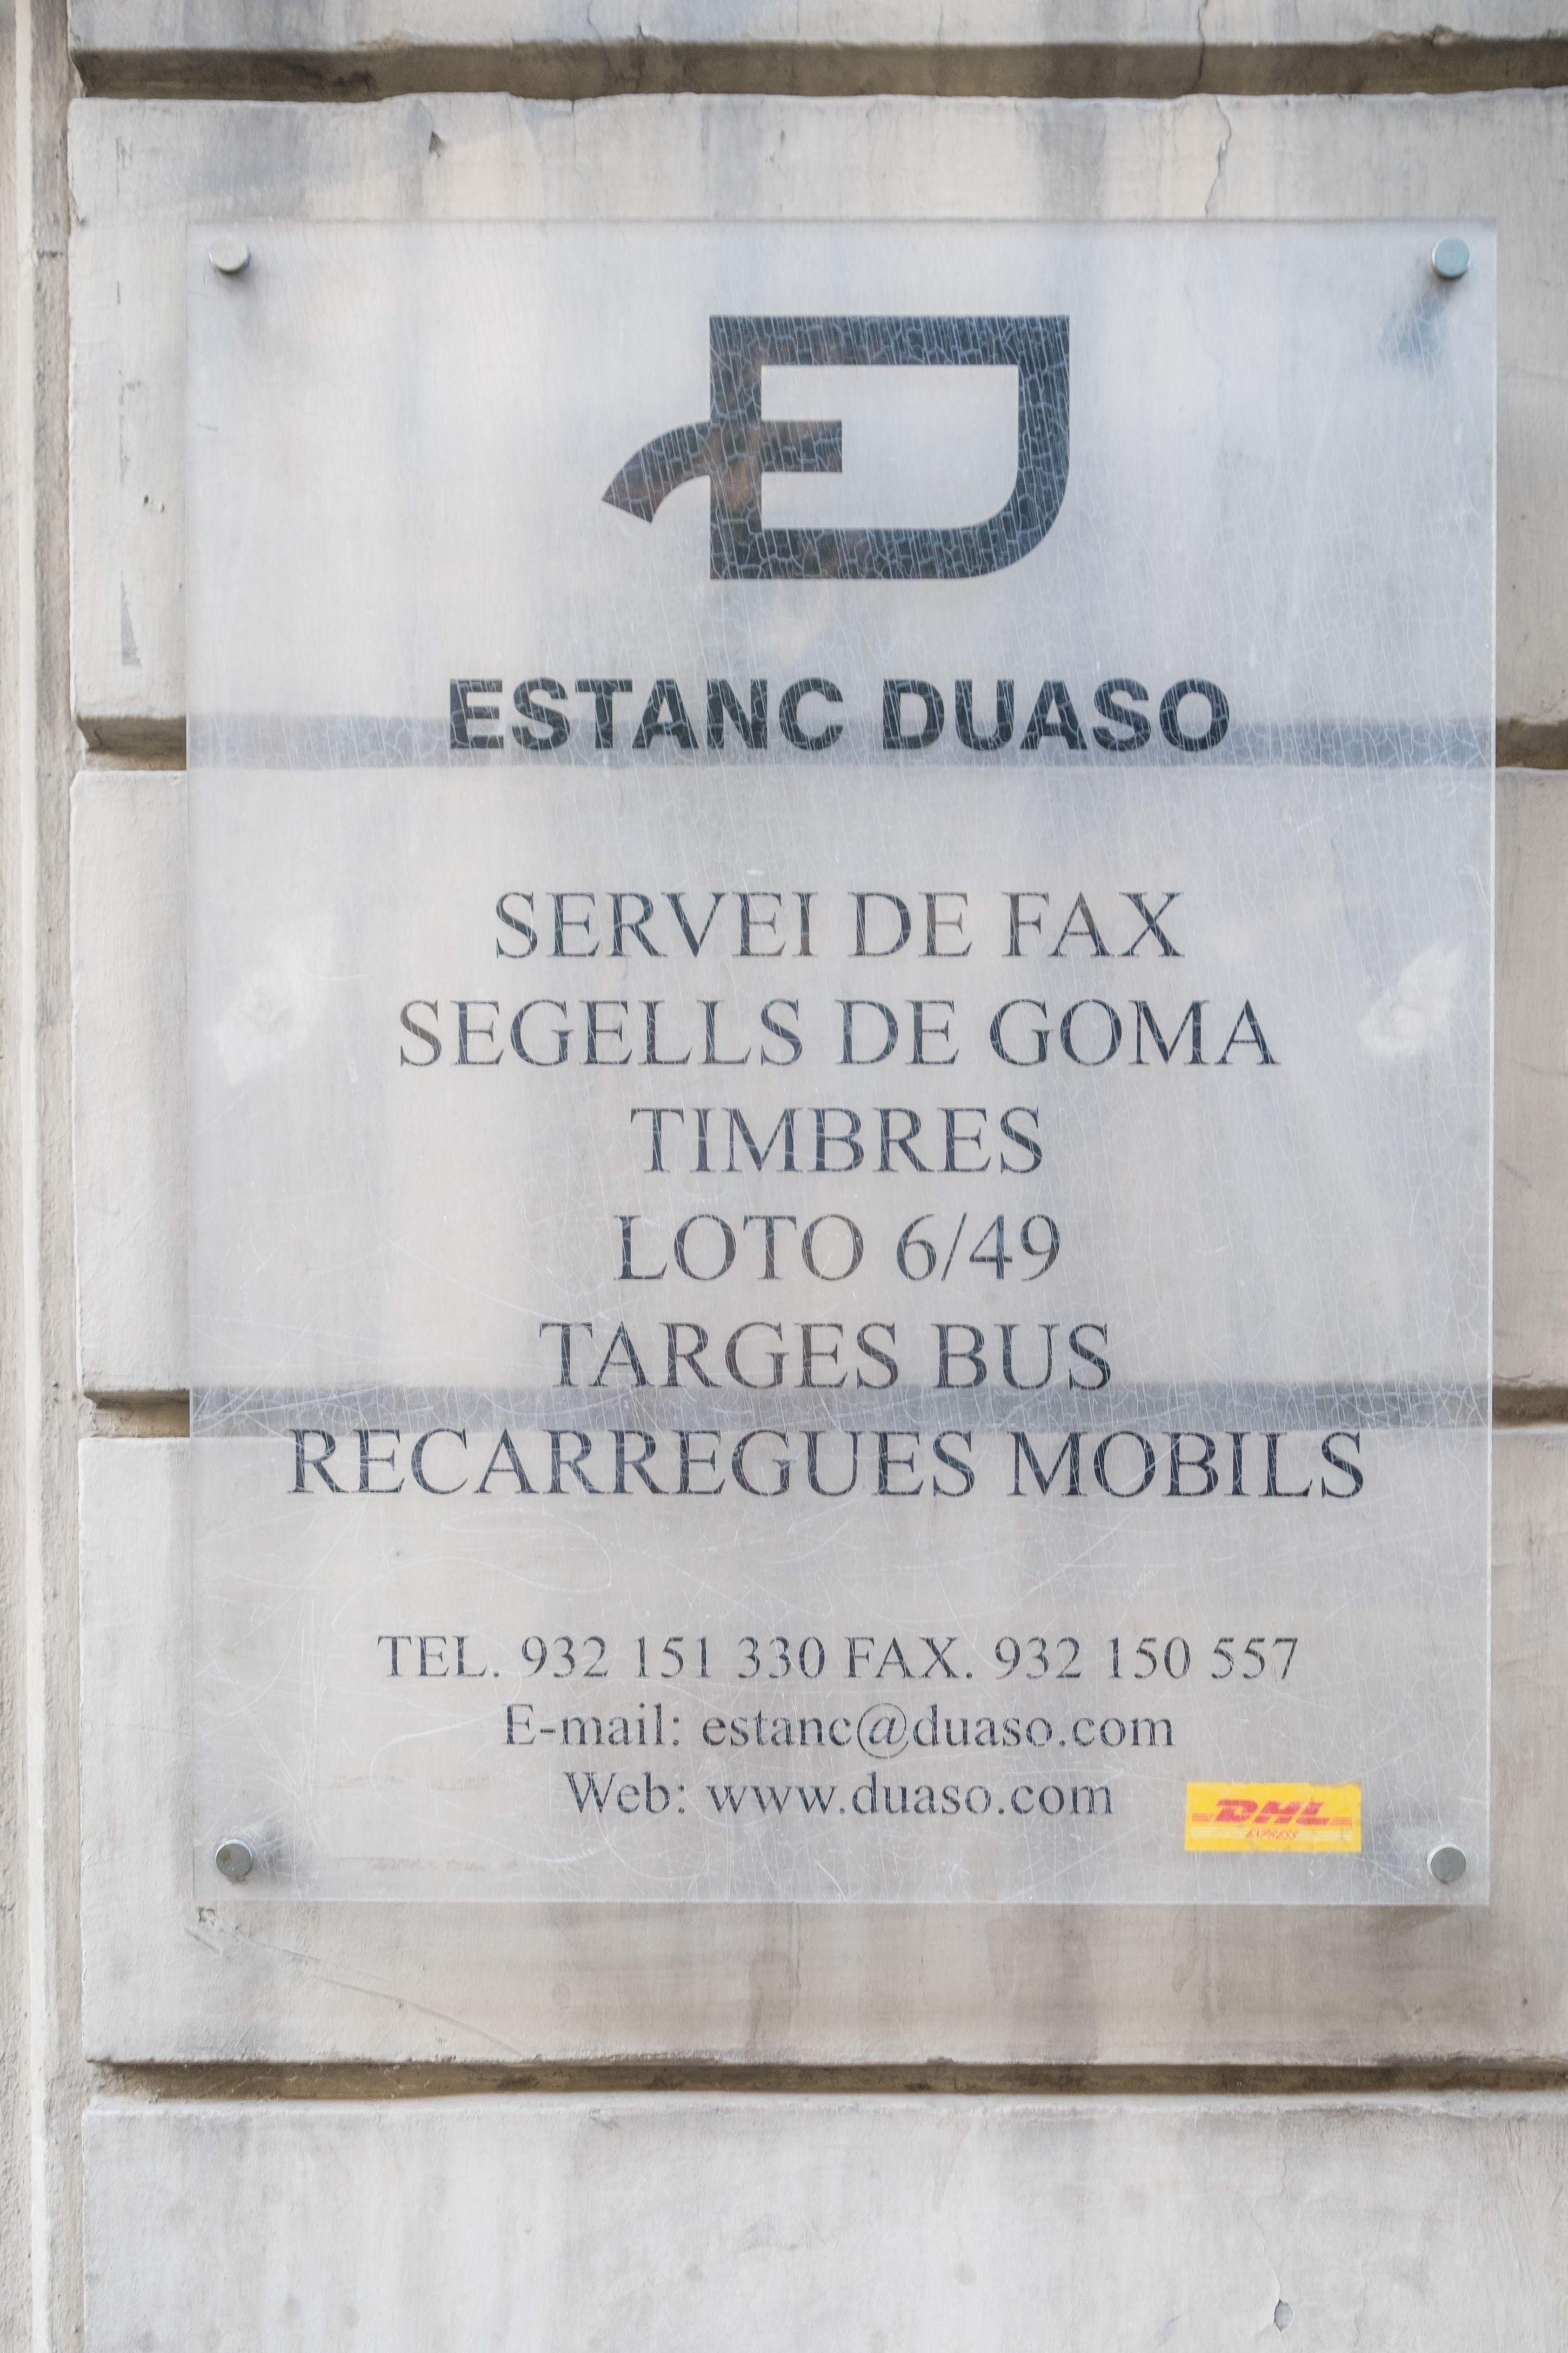 Foto 9 de Estancos en Barcelona | Estanc Duaso